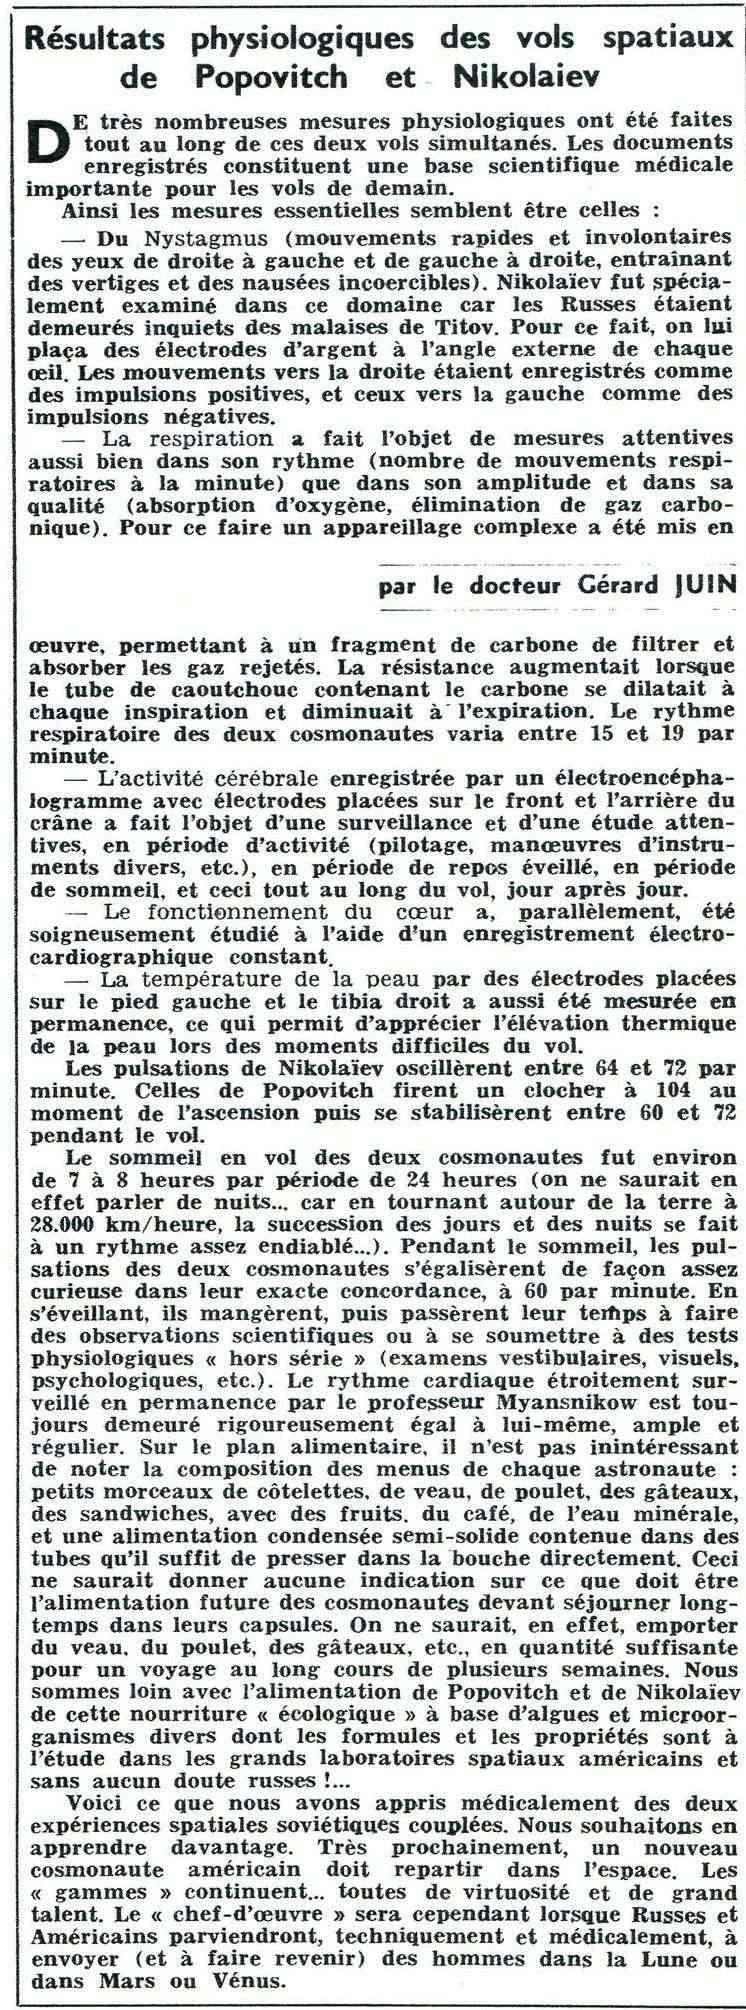 Vostok 3, Vostok 4 - 11, 12 août 1962 - 1ers vols groupés 62100111